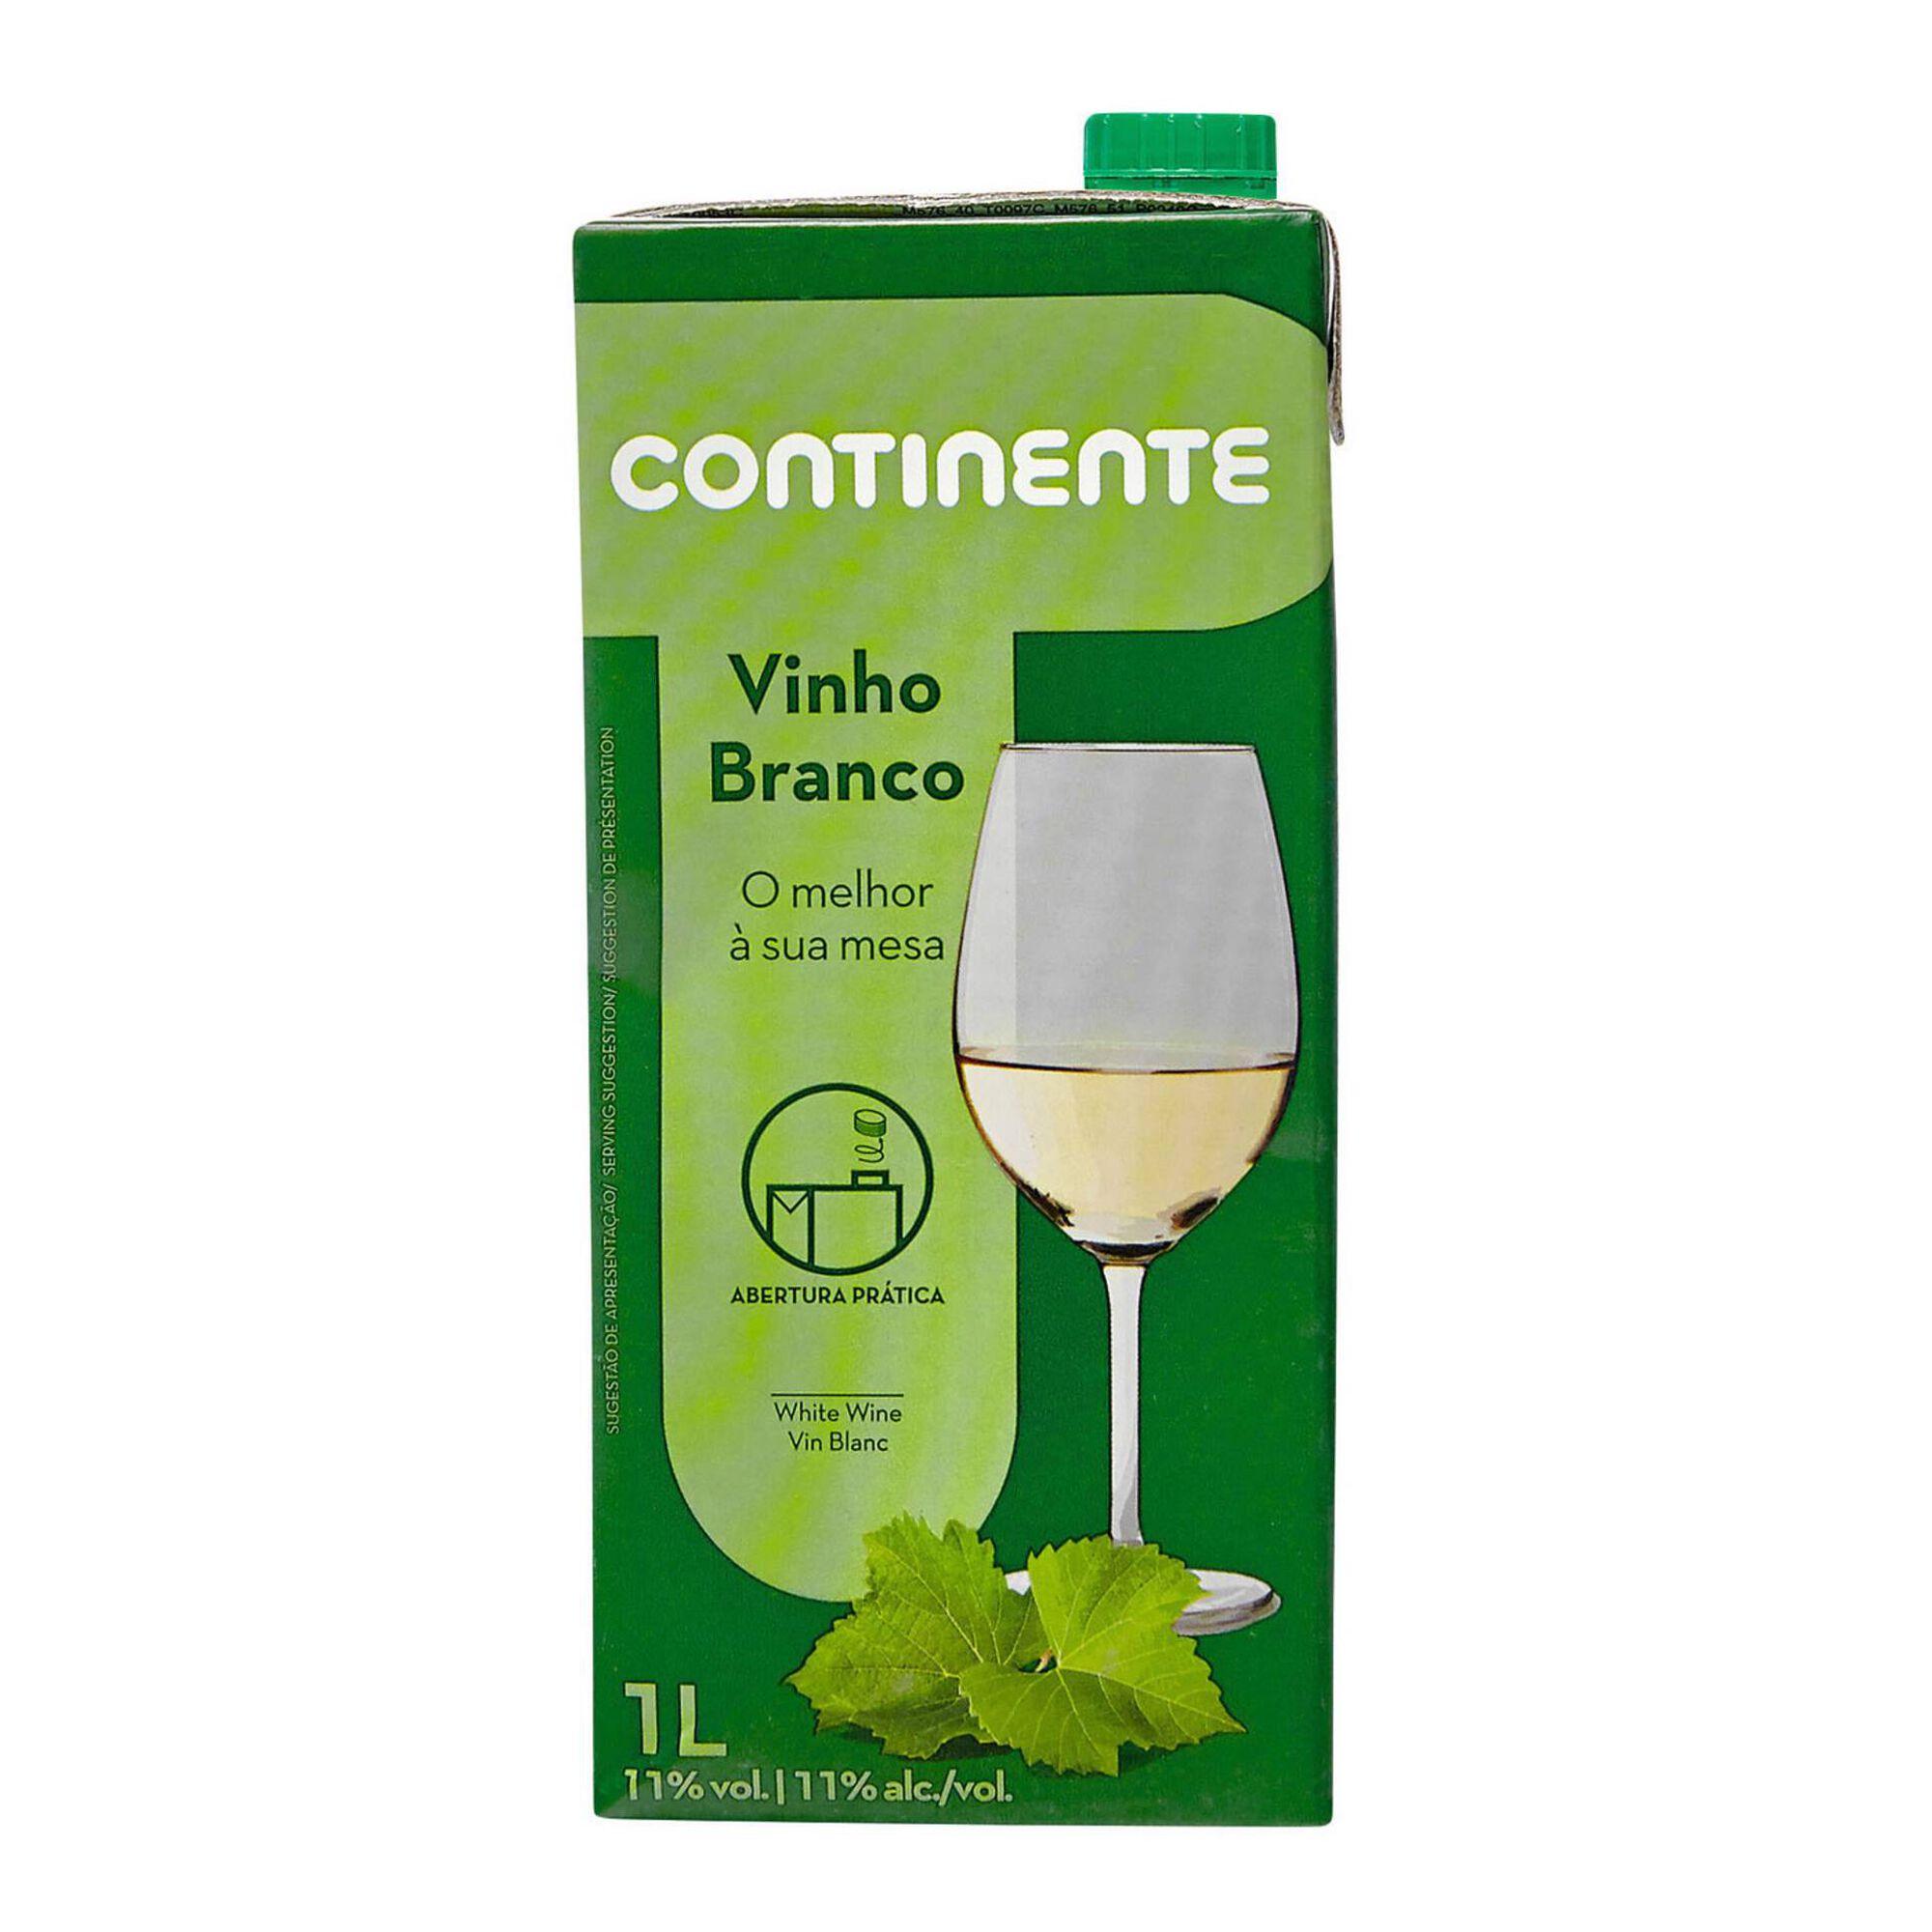 Continente Vinho Branco